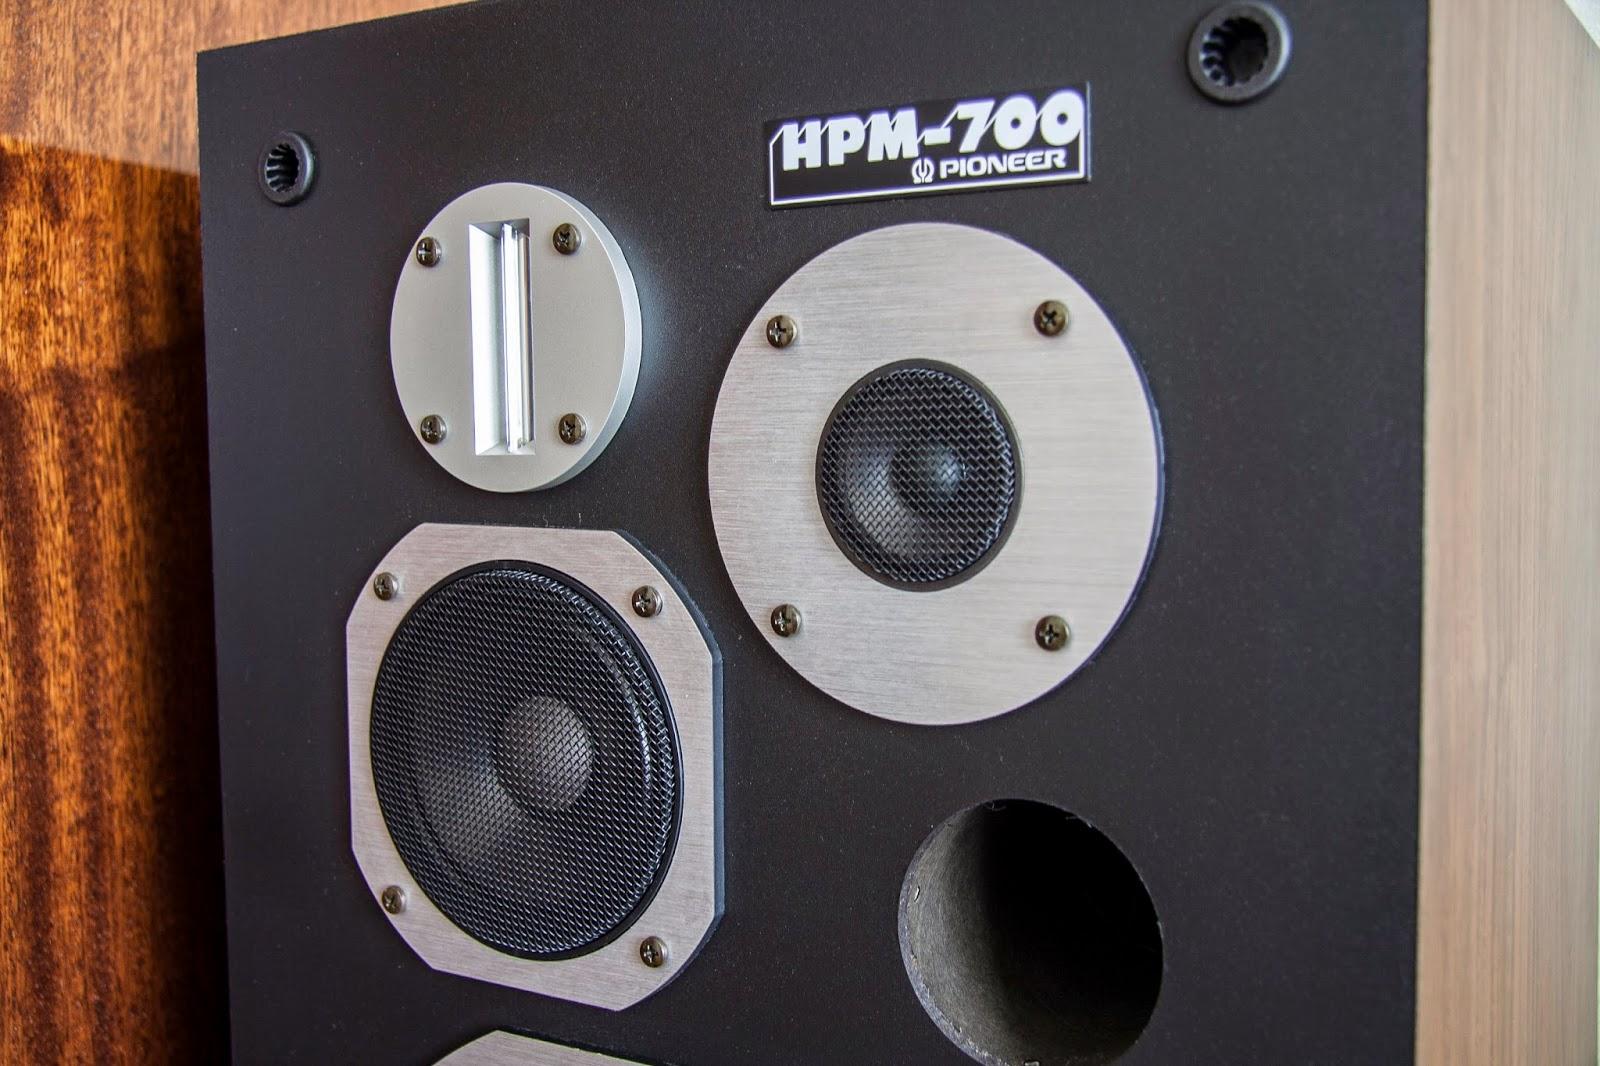 Golden Age Of Audio Pioneer Hpm 700 Speakers